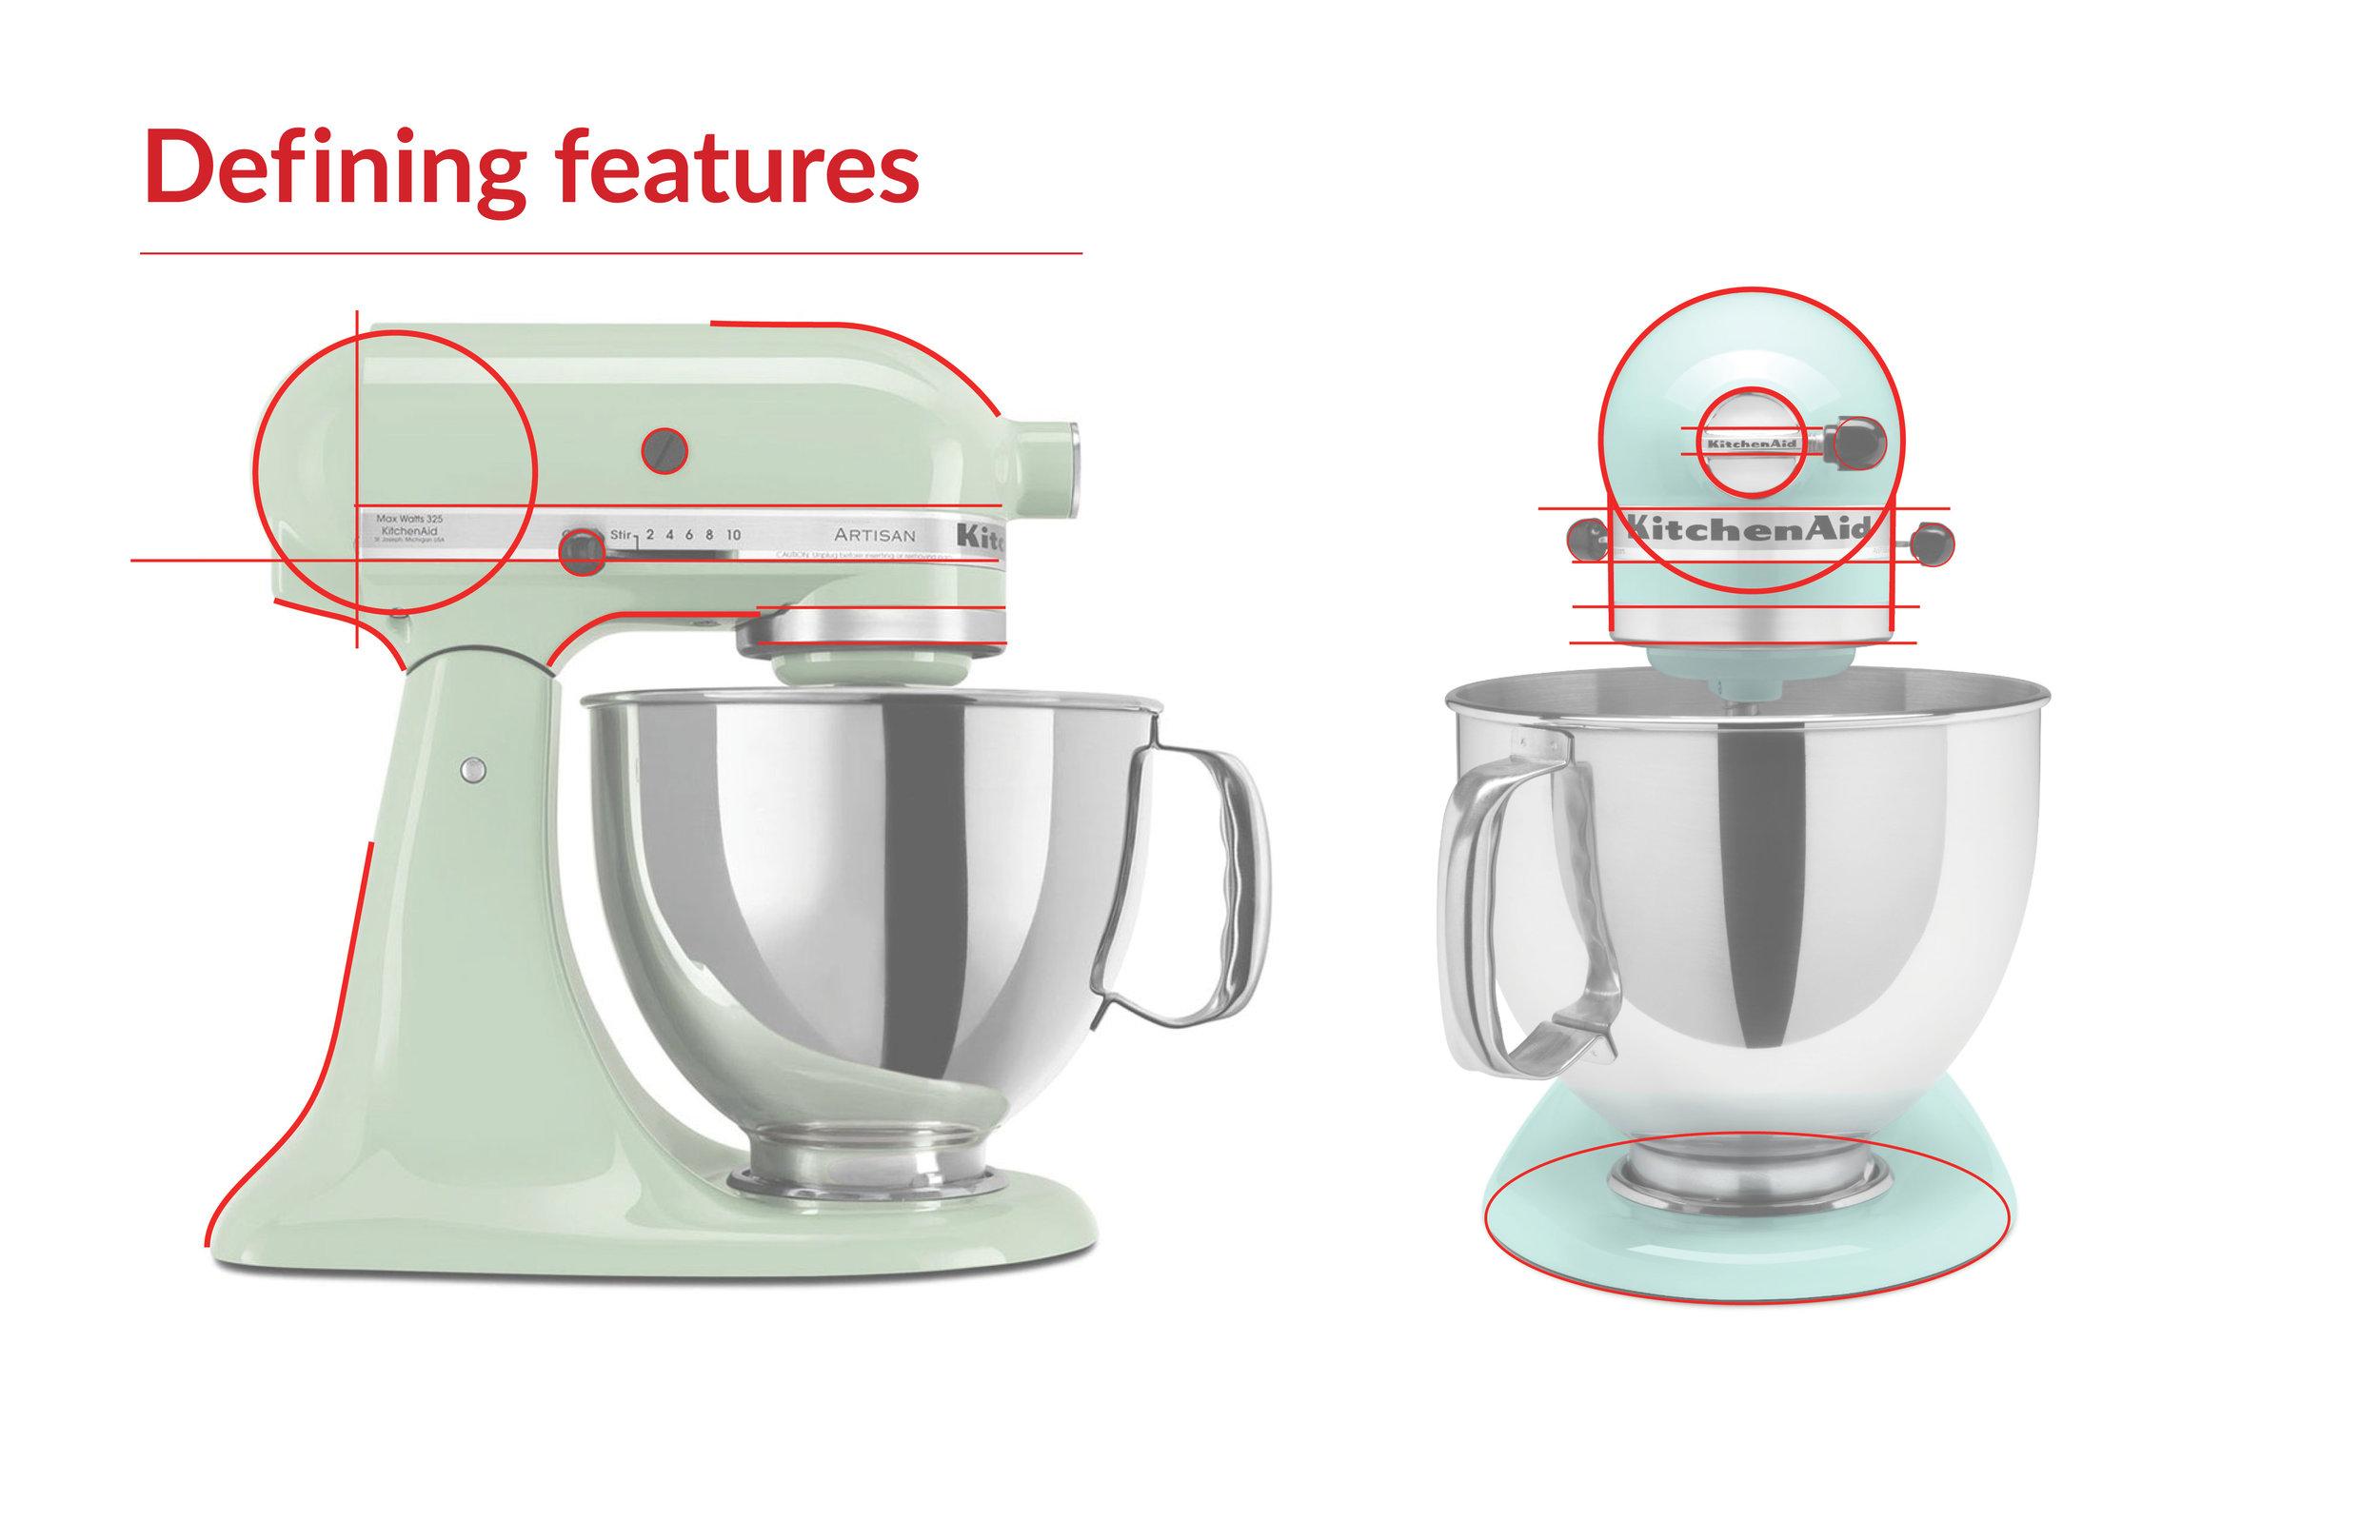 KitchenAid - Style Guide5.jpg